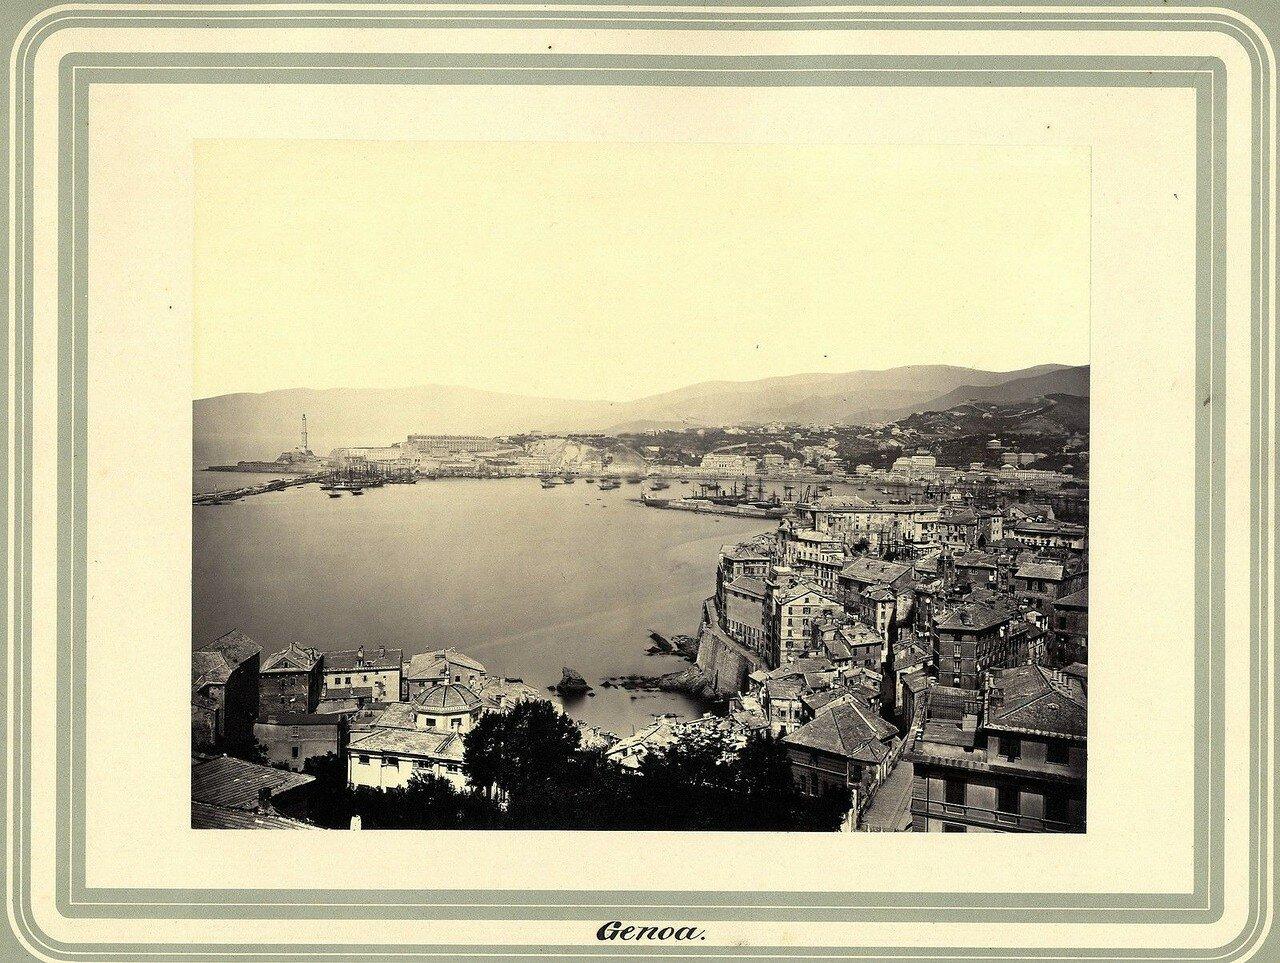 Генуя. Панорама города. 1860